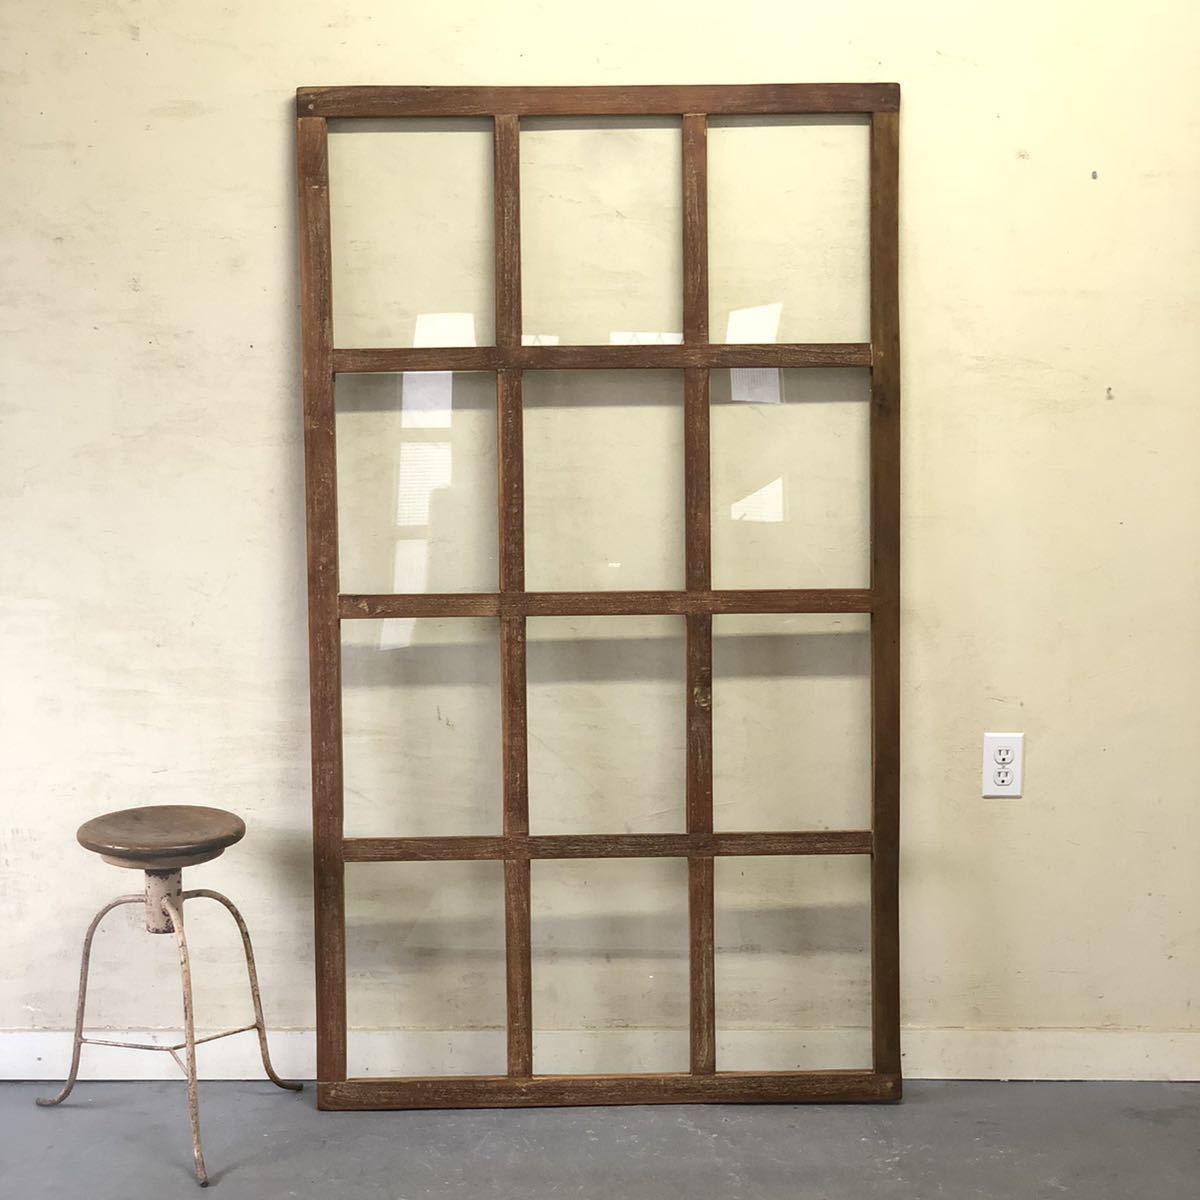 SJ-03〓W100×H72 格子窓 アンティークチークの木製ガラス建具 ハメ殺し 店舗リノベーション パーテーション 扉 建具 DIY ftg